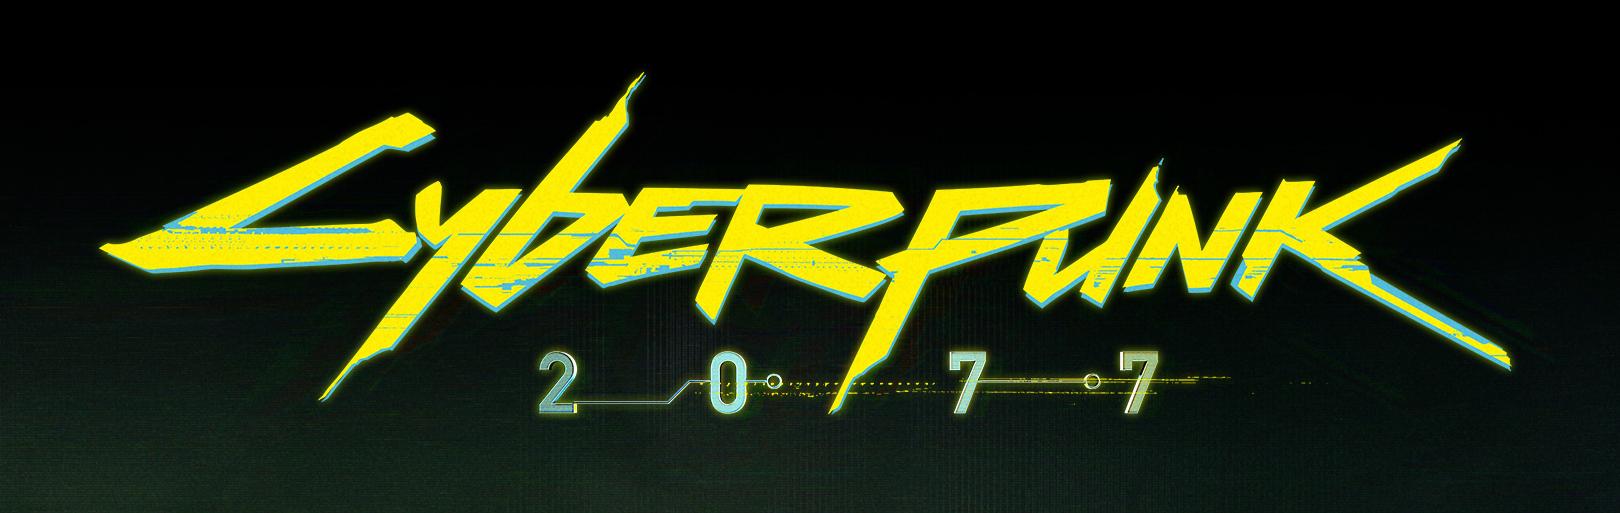 https://upload.wikimedia.org/wikipedia/fr/3/37/Cyberpunk_2077_Logo.jpg